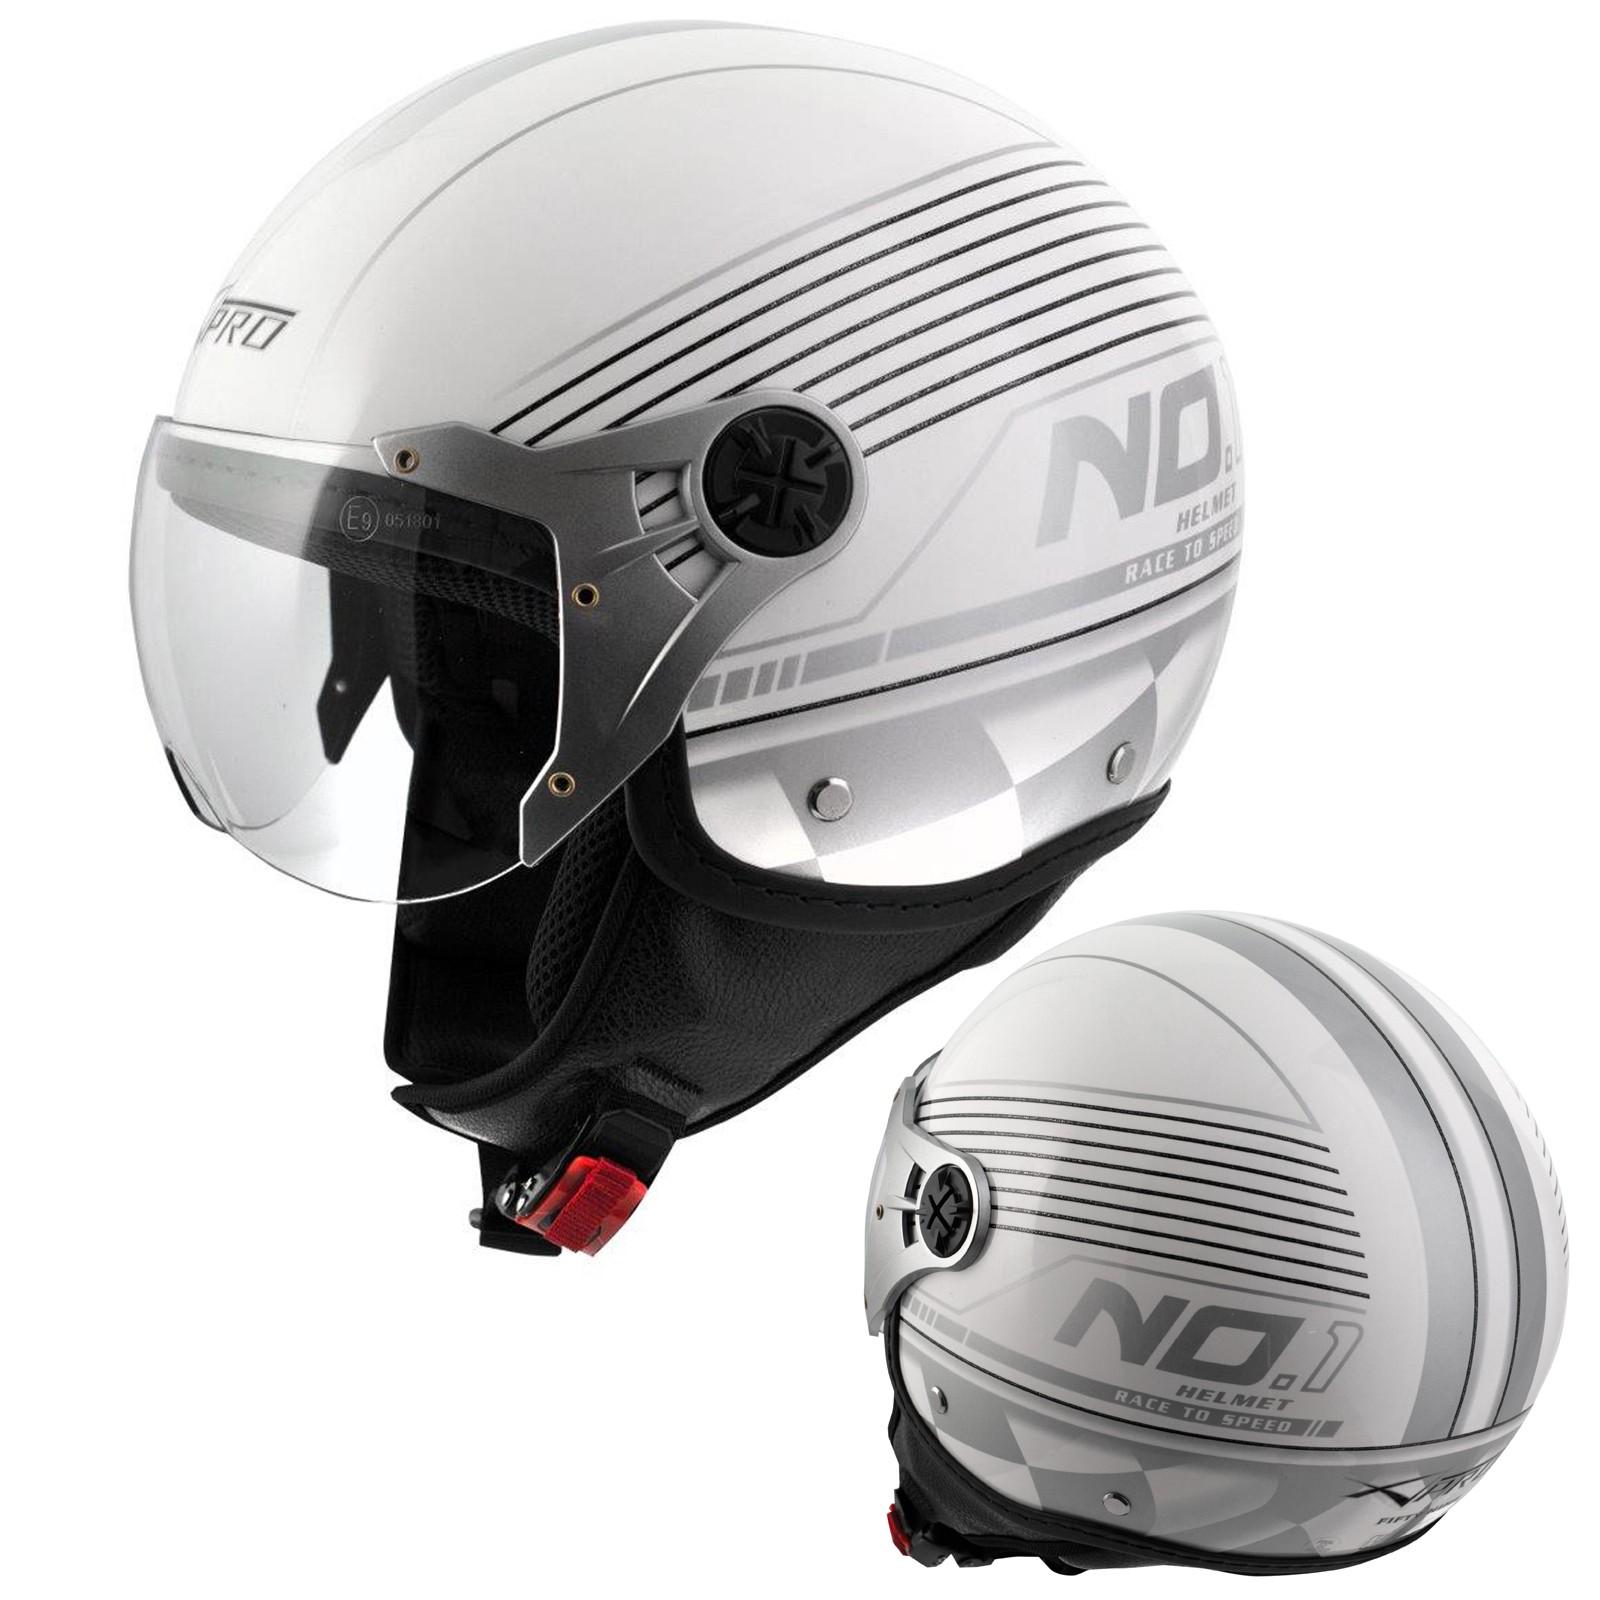 e00eca8c7749b fifty Casco Helmet Moto Motorcycle OpenFace Jet Size. Demi Jet Homologado  ECE 22-05 Casco Moto Scooter Avio Visor Blanco. 57% OFF